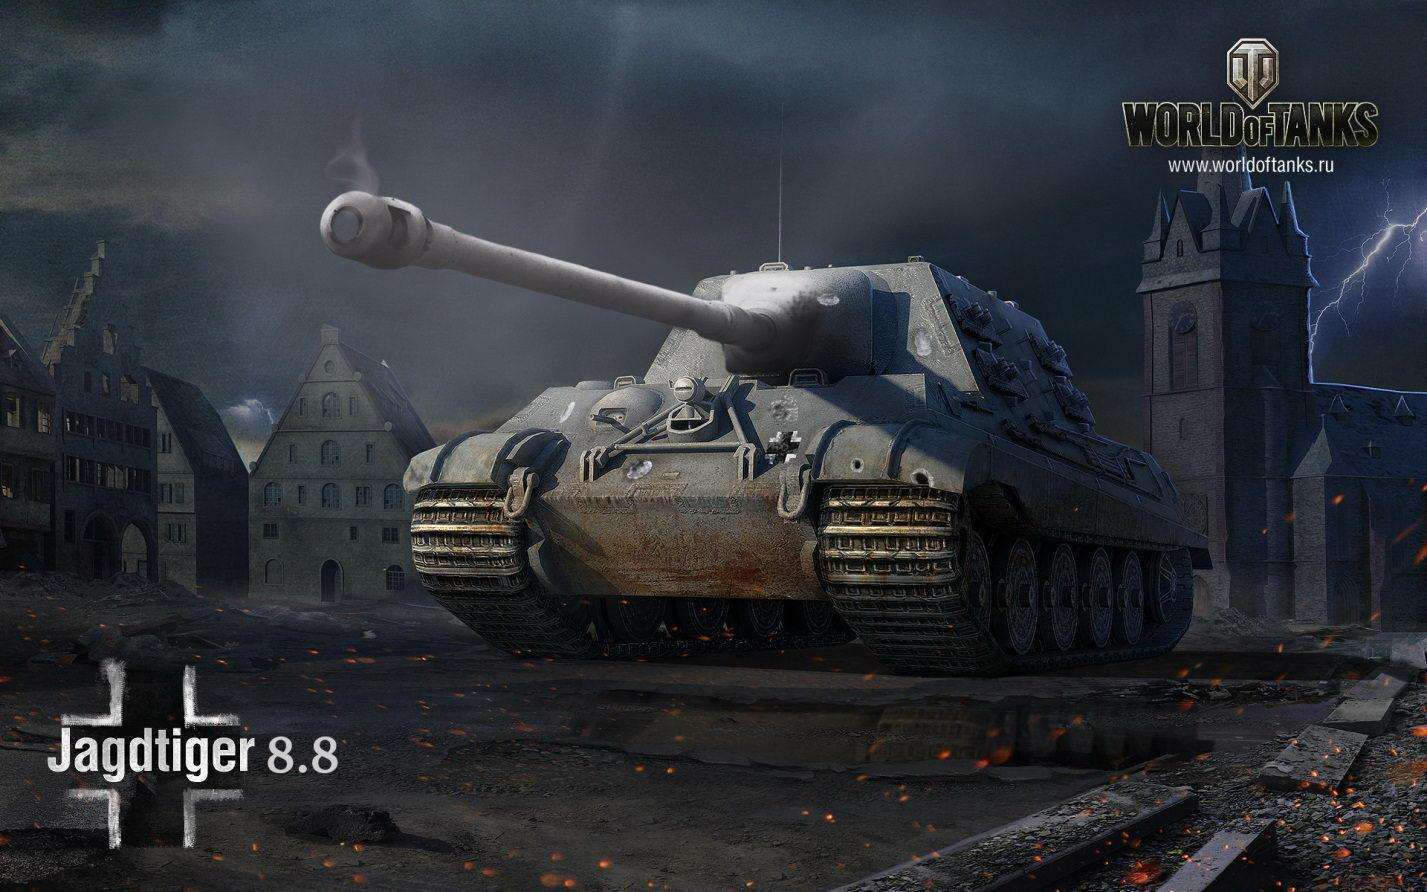 http://i54.fastpic.ru/big/2013/0114/4f/aaf7aad4b6612c11ab7bf4291440ff4f.jpg